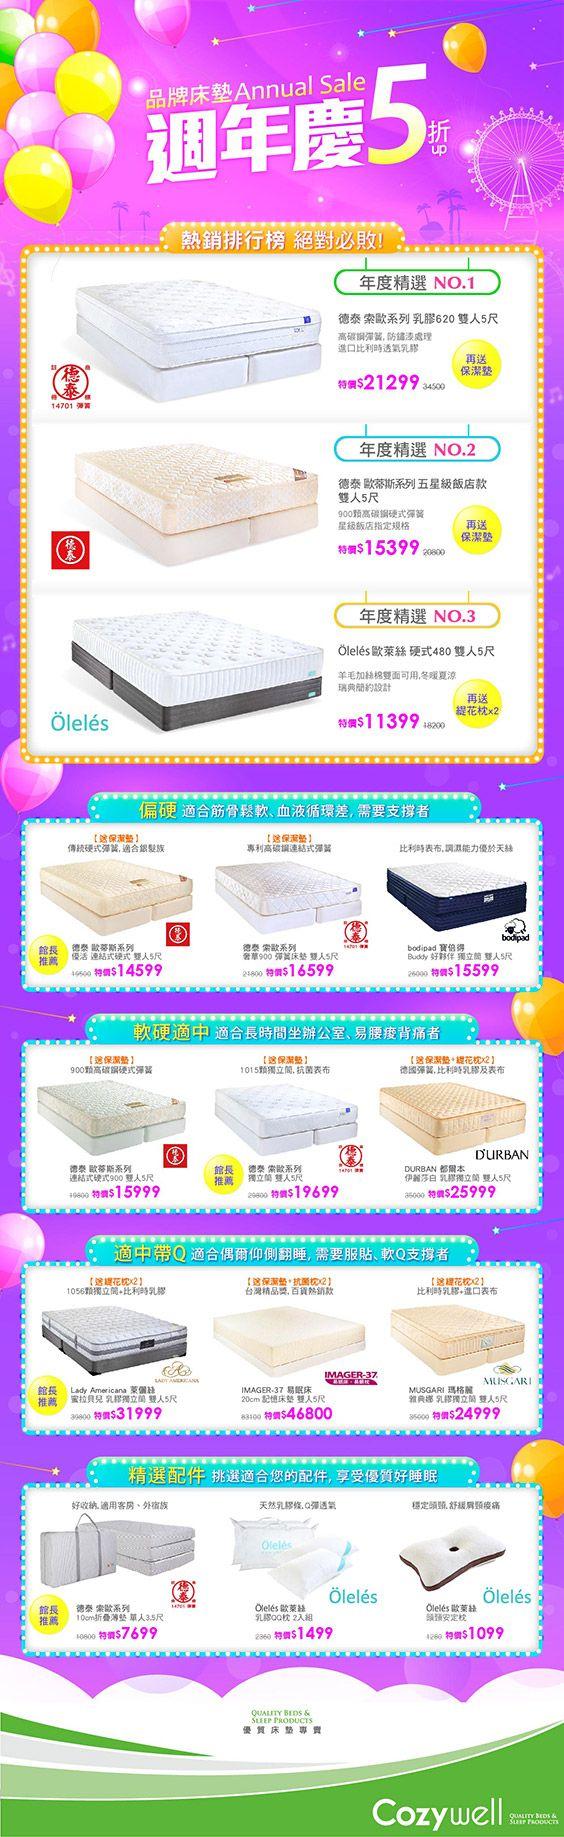 2017-09-mattress edm